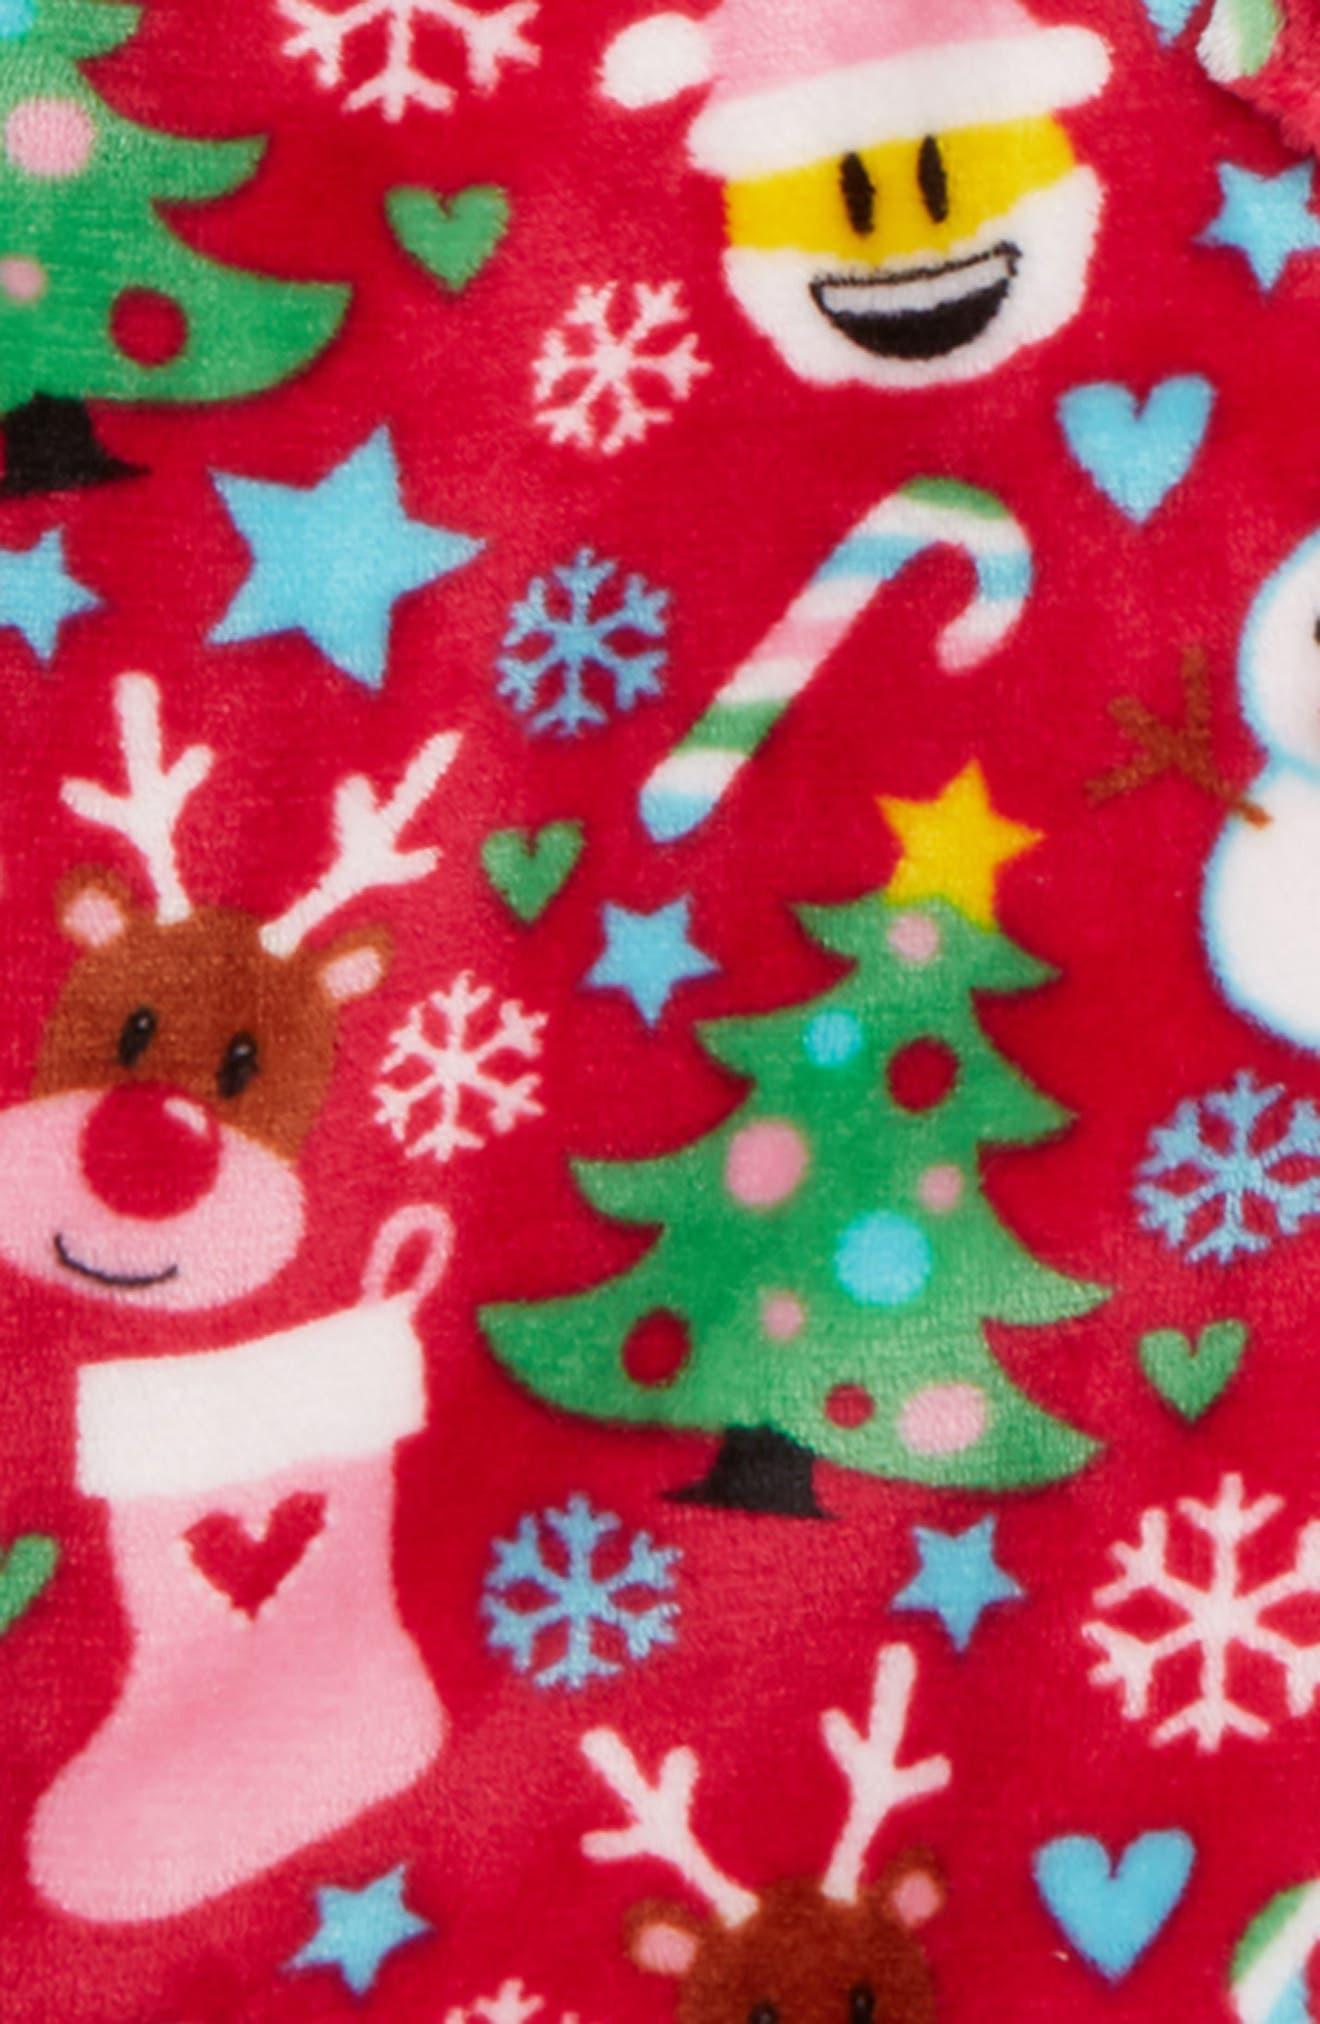 Holiday Fleece Robe,                             Alternate thumbnail 2, color,                             XMAS RED